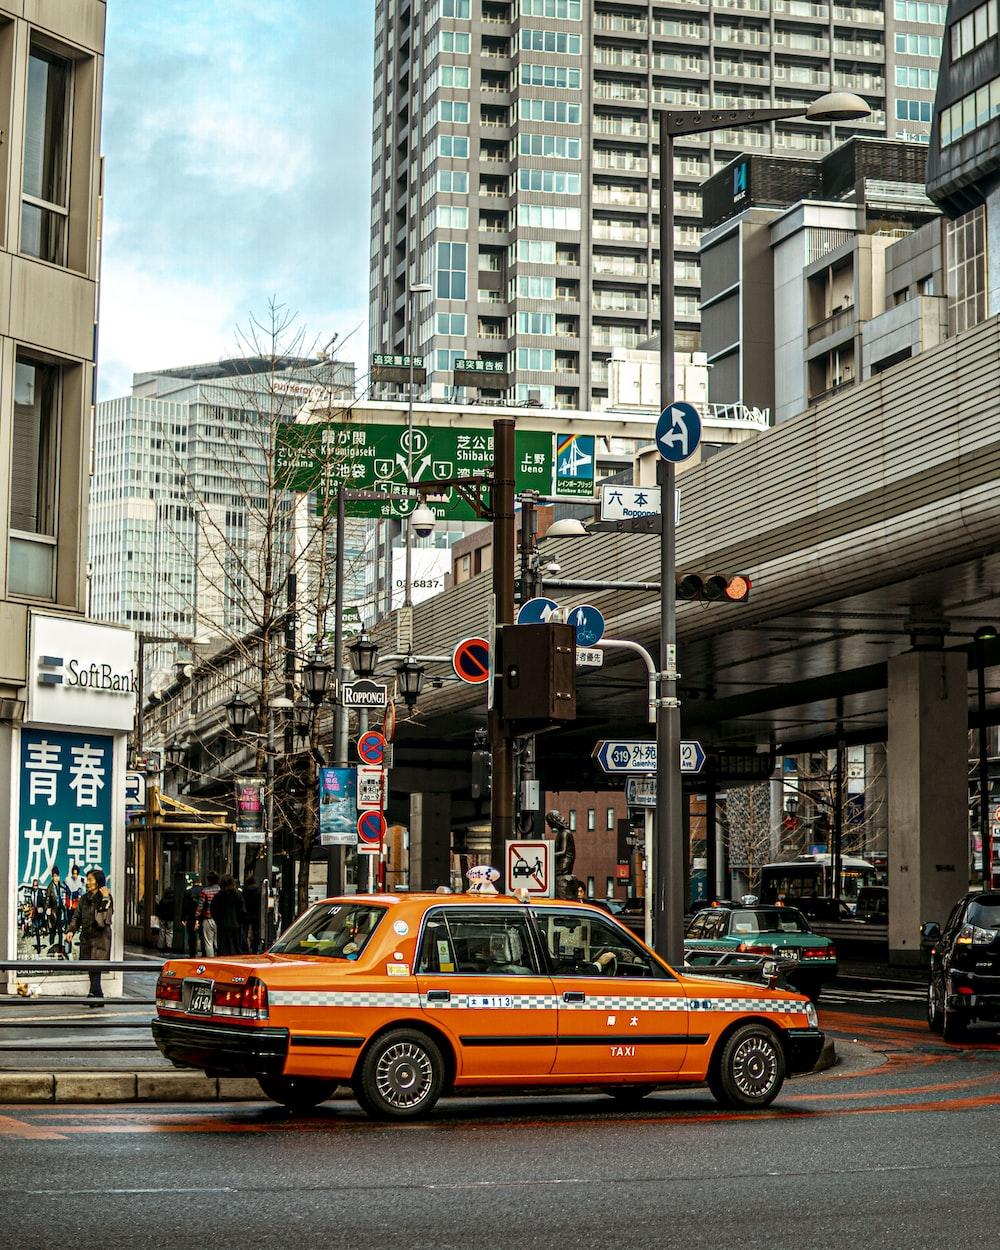 red sedan on road near buildings during daytime